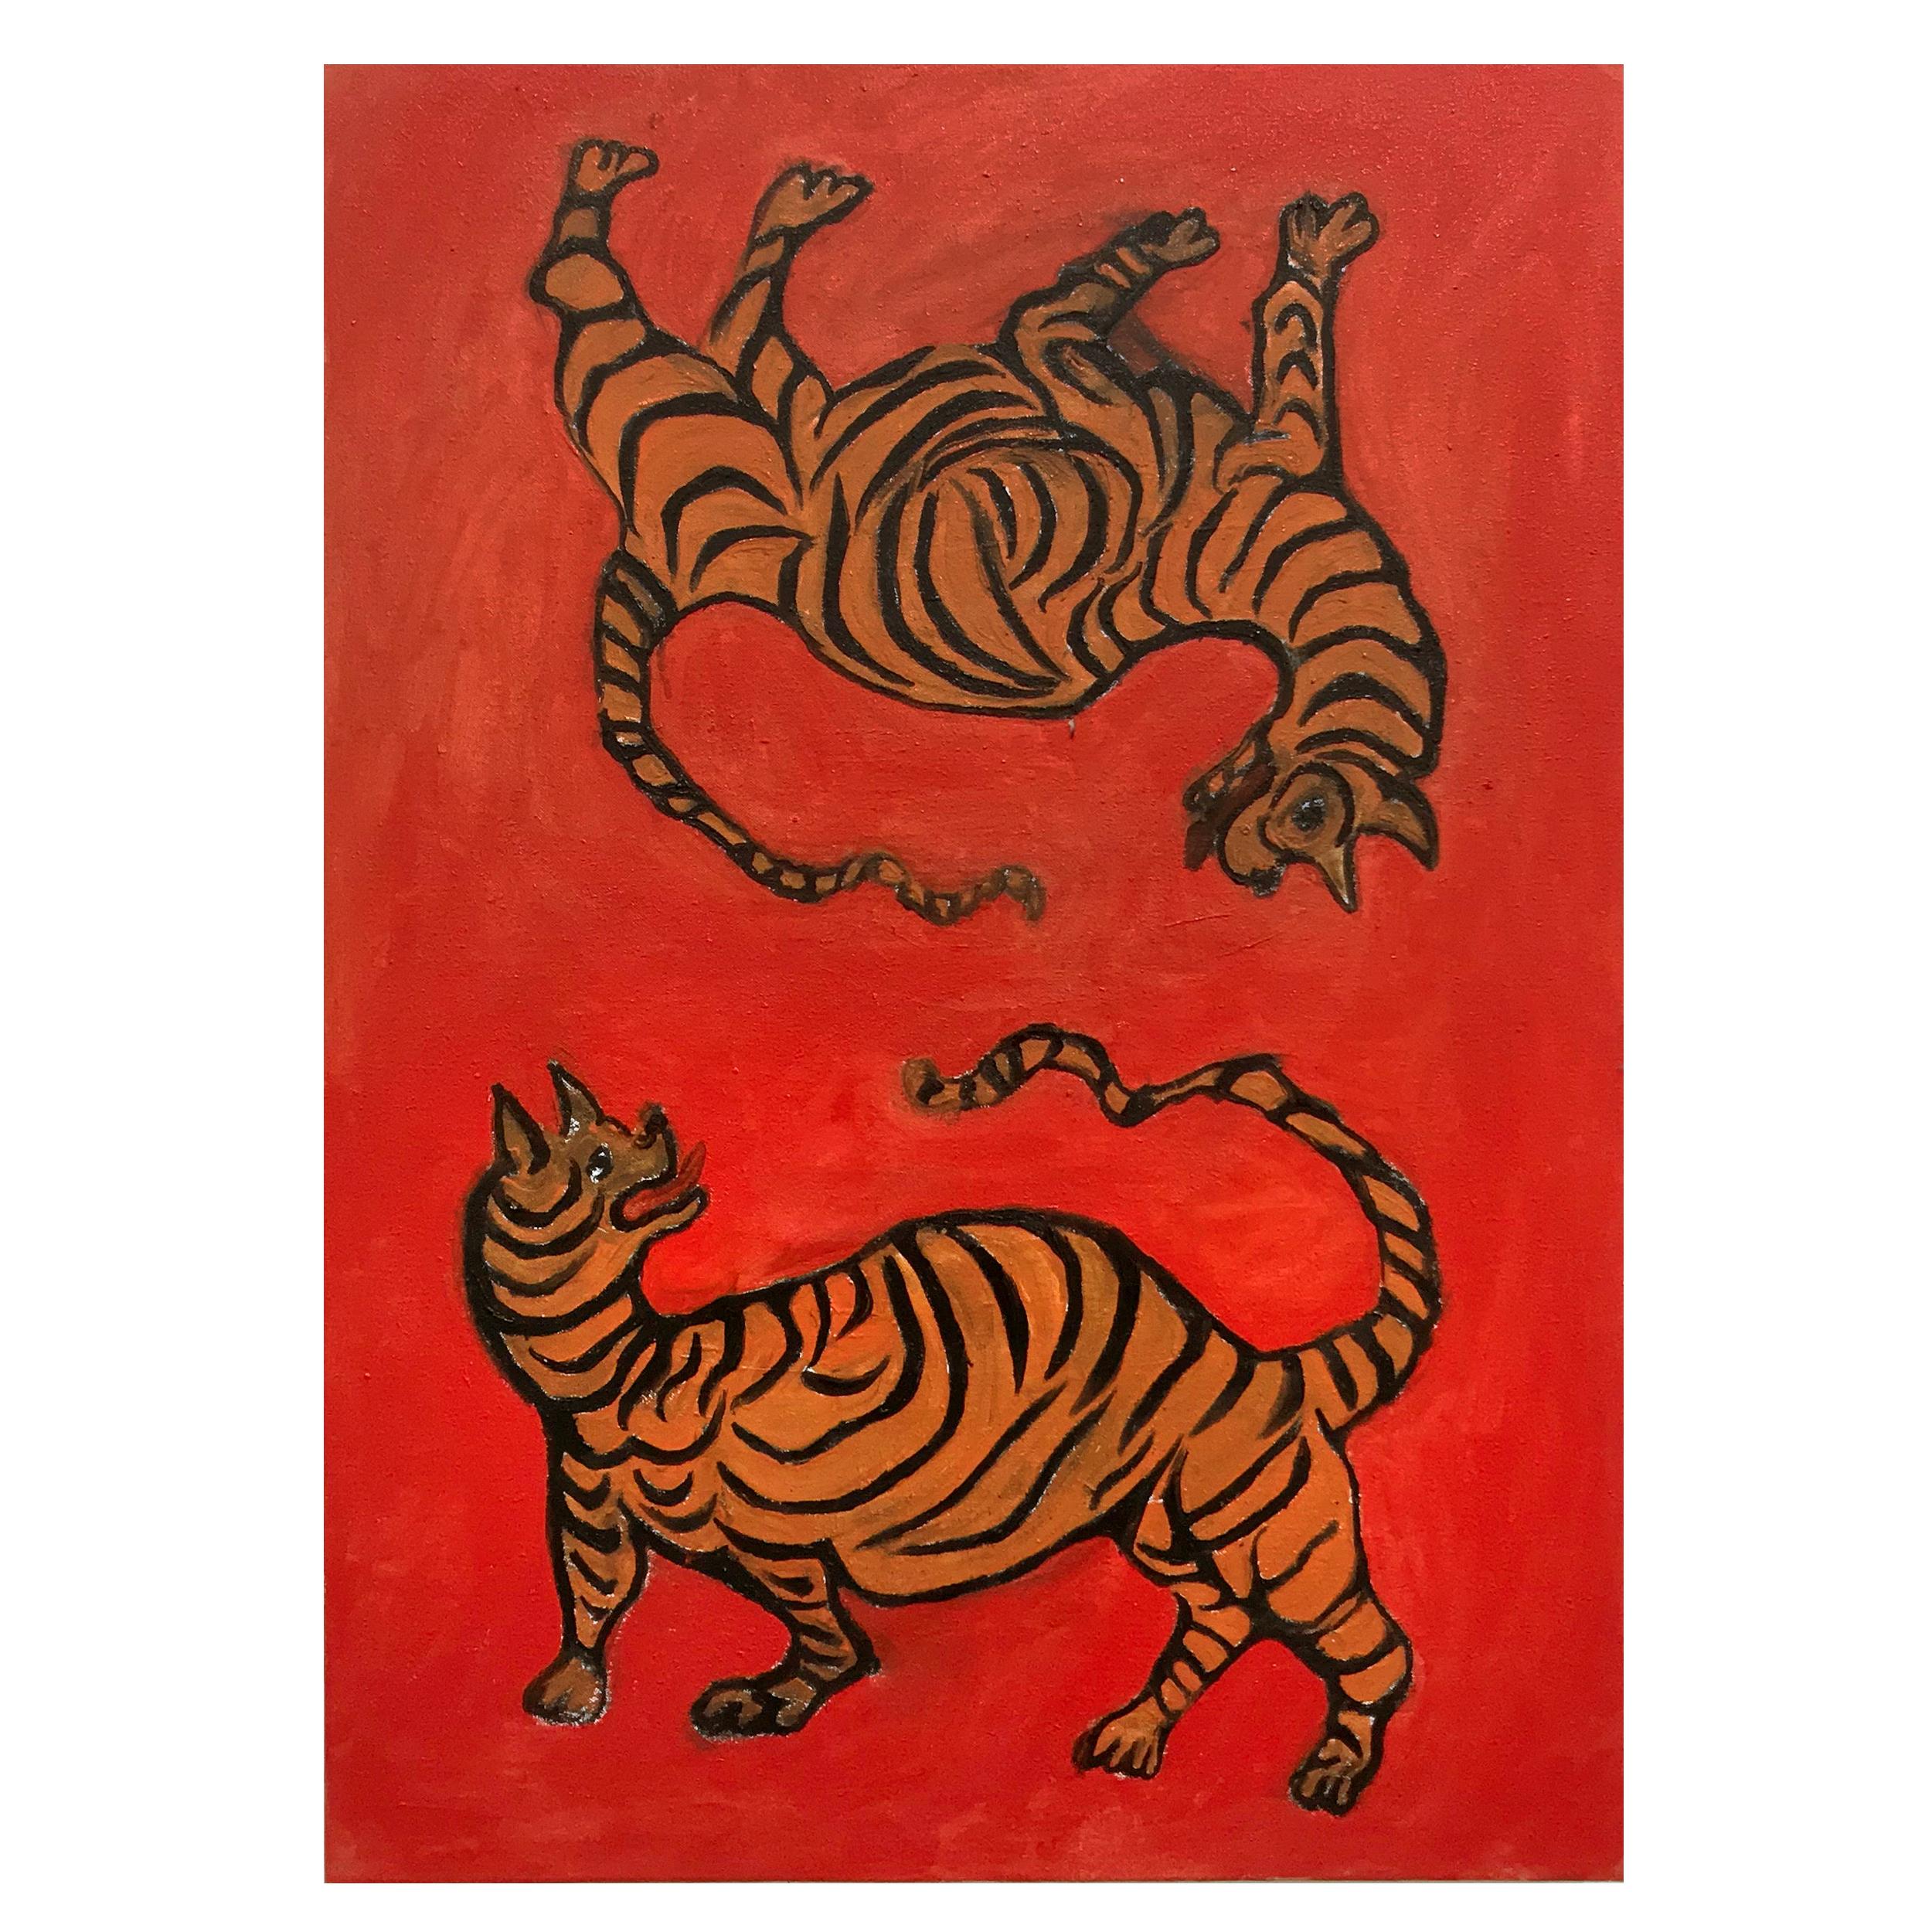 'Tiger, Tiger I Got You'   40x70cm  Oil on Canvas  2019